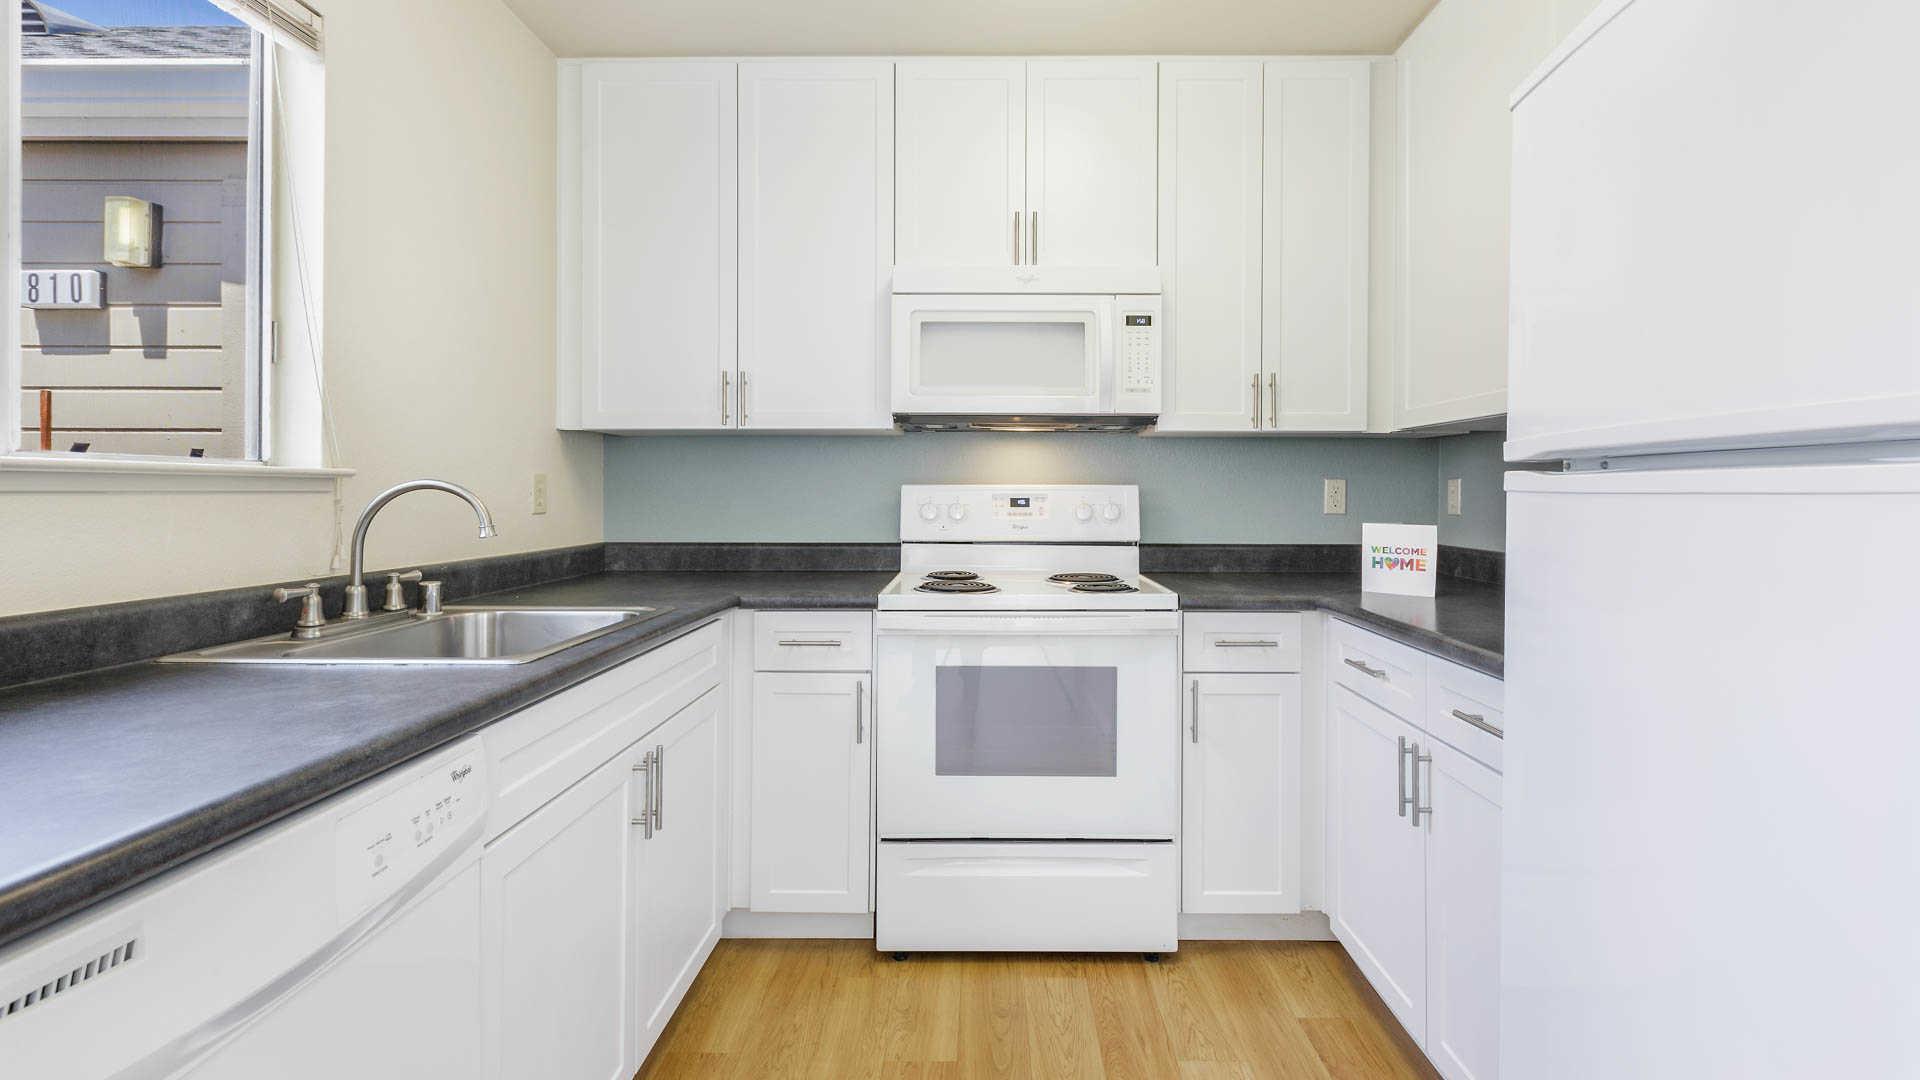 Fancy Hillwood Kitchens Frieze - Kitchen Cabinets | Ideas ...